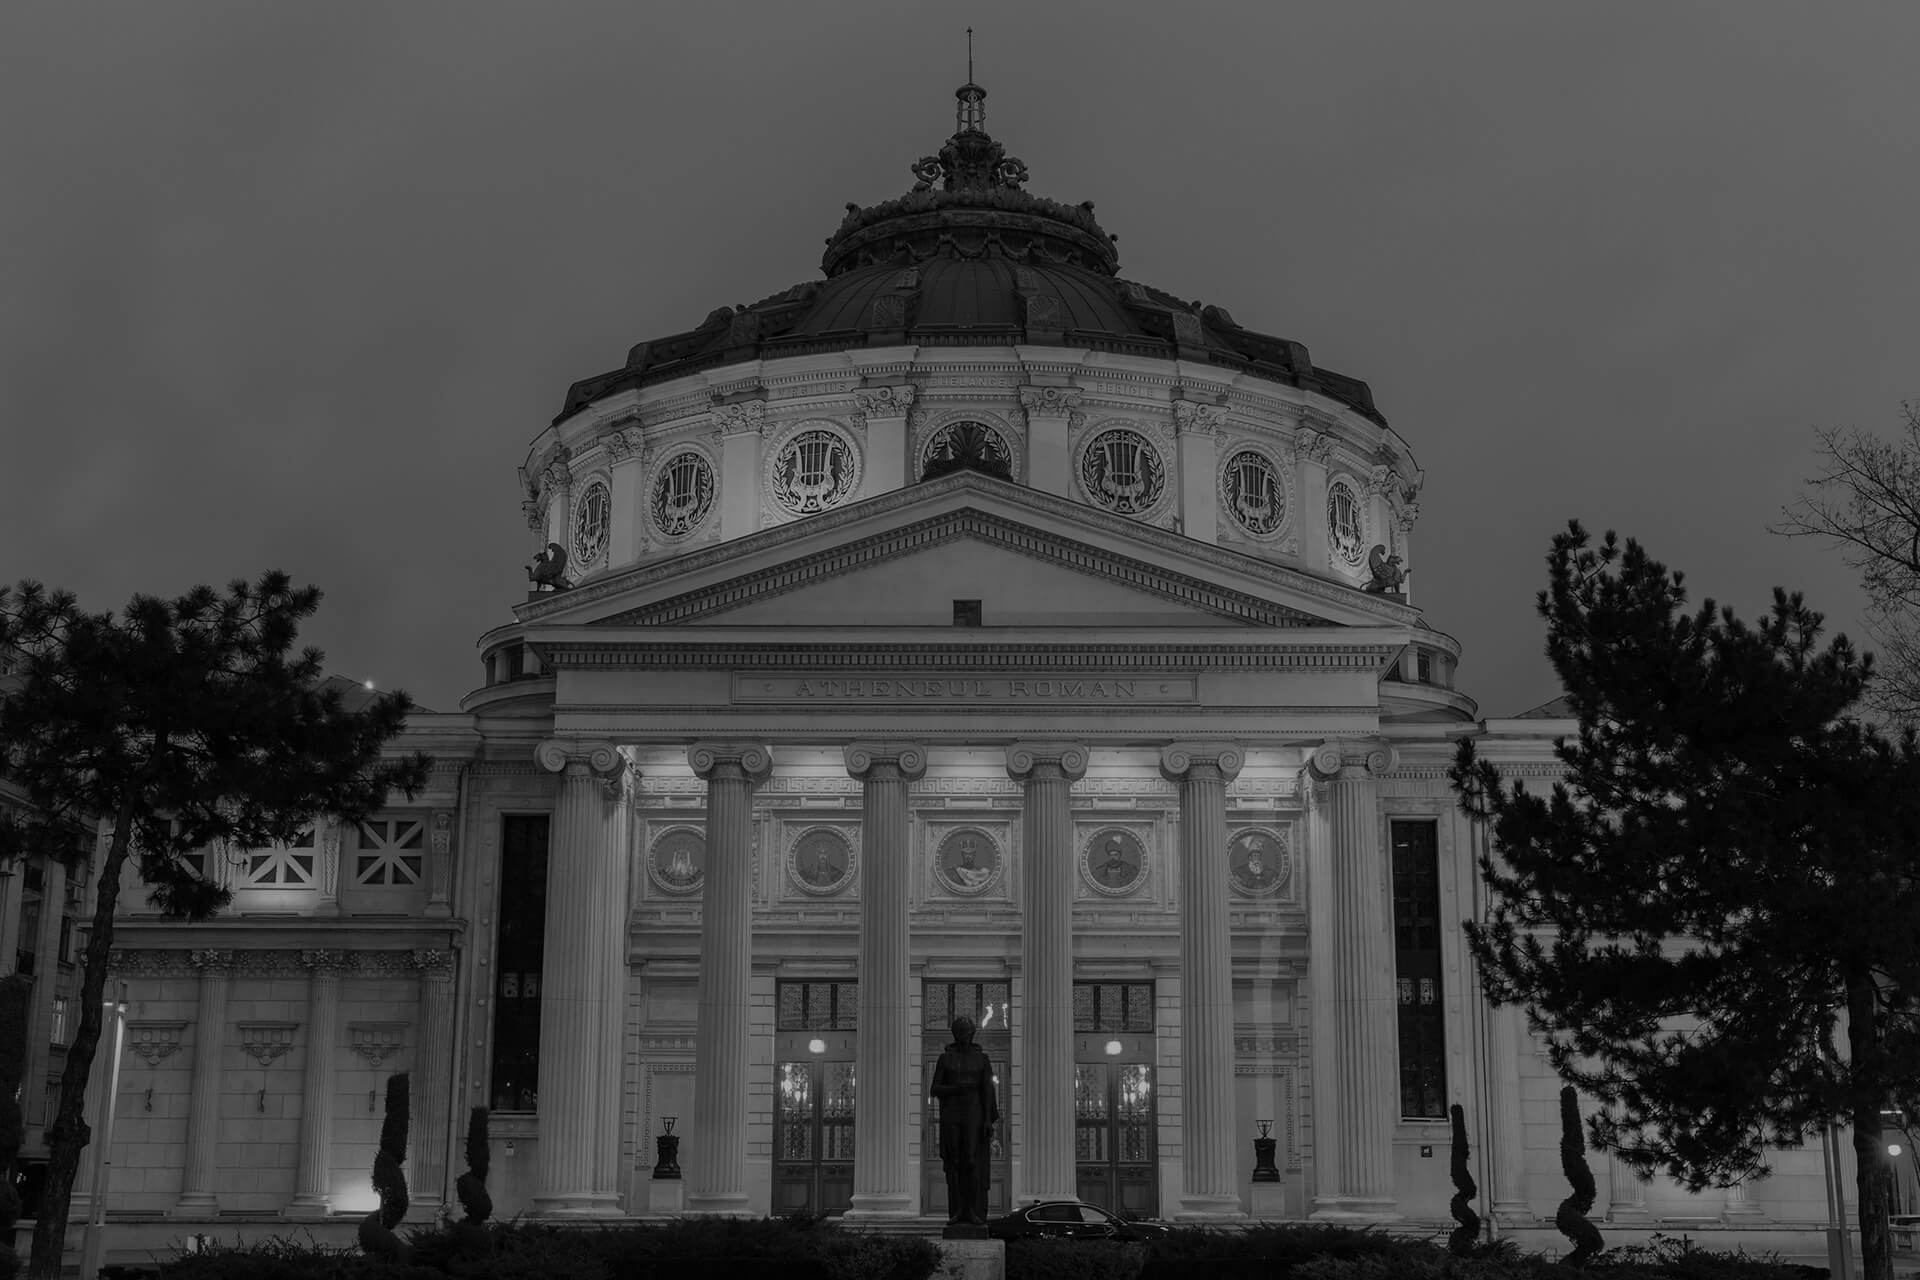 Athanasios Fragkos - Bucharest